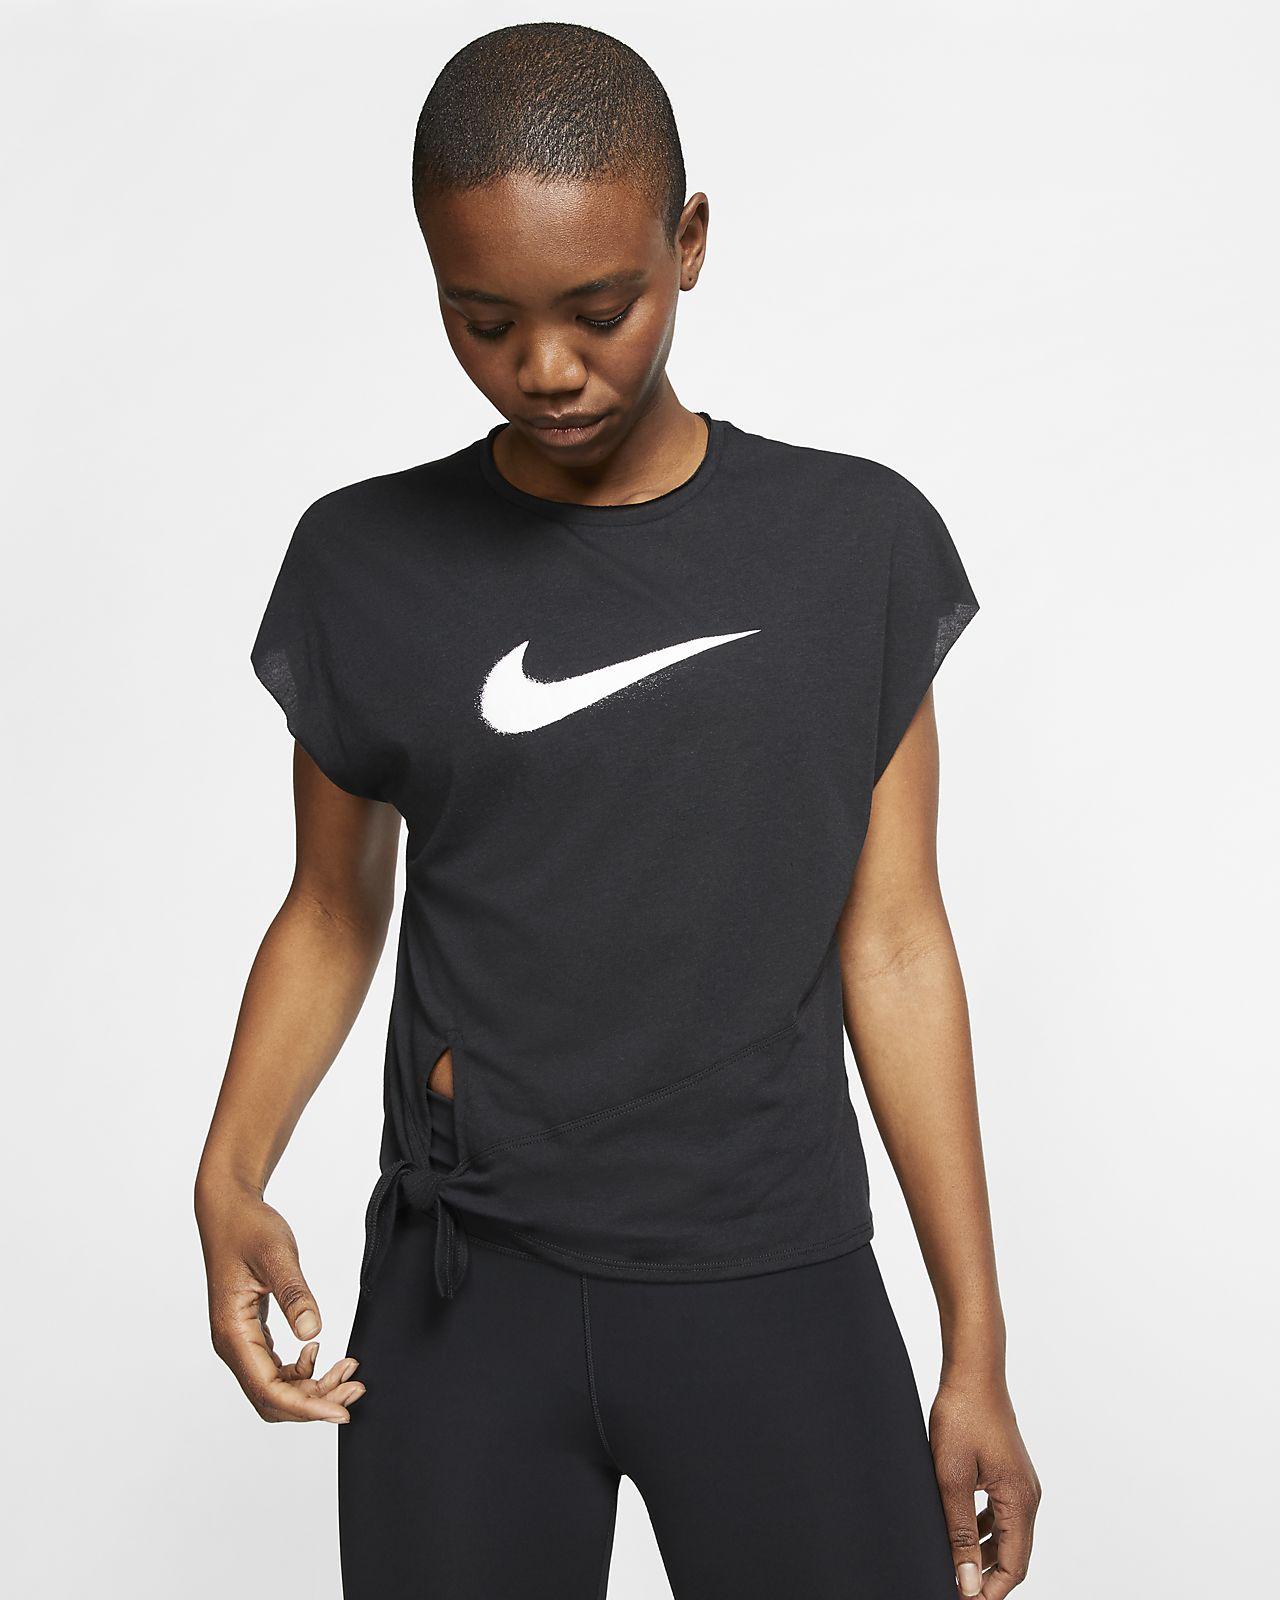 Nike Dri-FIT 女子短袖训练上衣